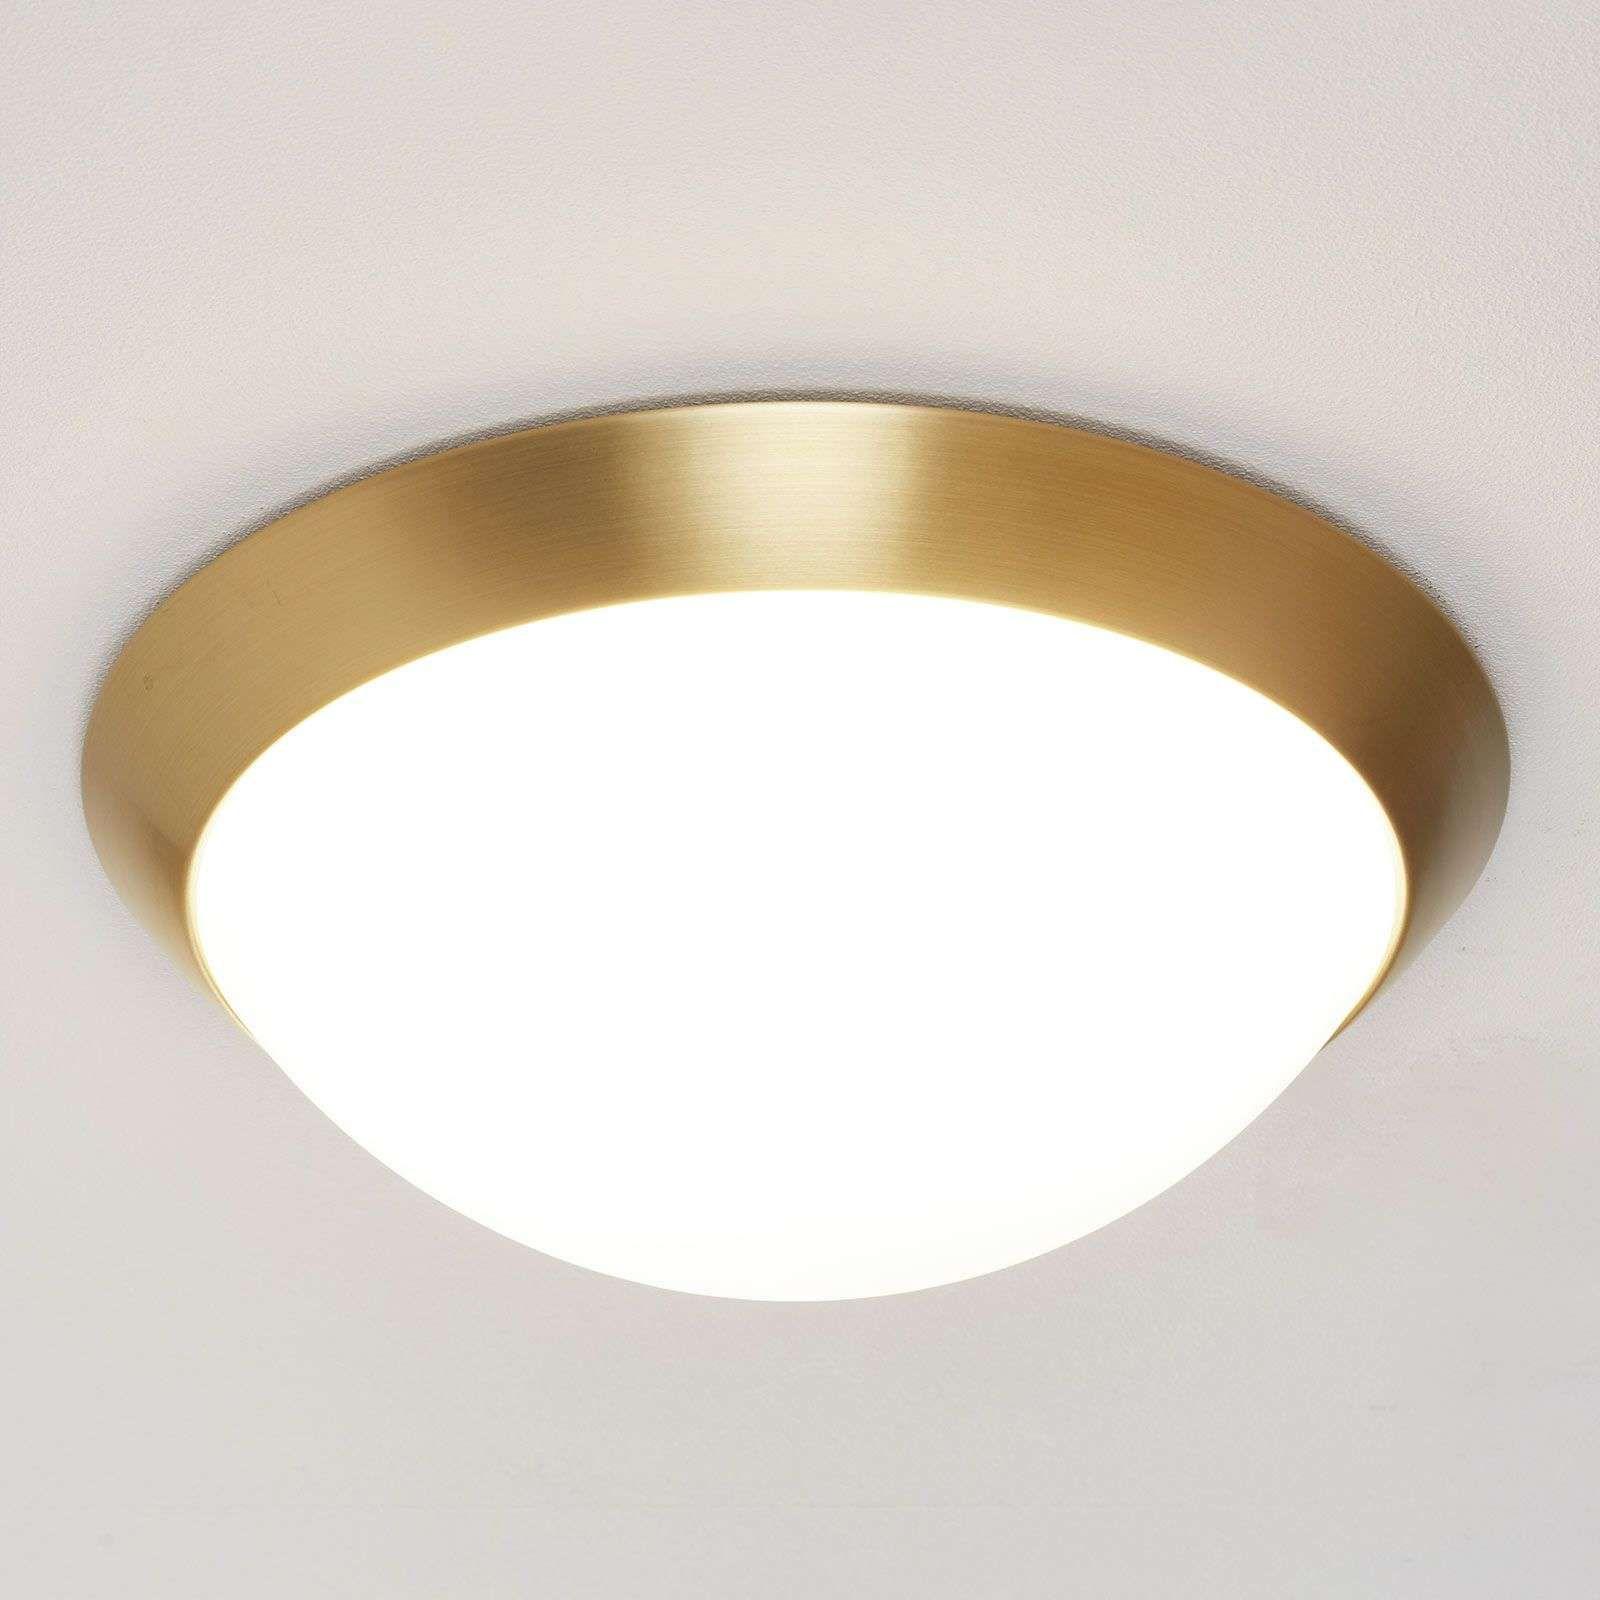 Lampen Plafond Woonkamer Platte Plafondlamp Led Led Lamp Met Sensor Kruidvat Led Plafonniere Met Bewegingsmelder Plafondlamp Lampen Plafond Geblazen Glas